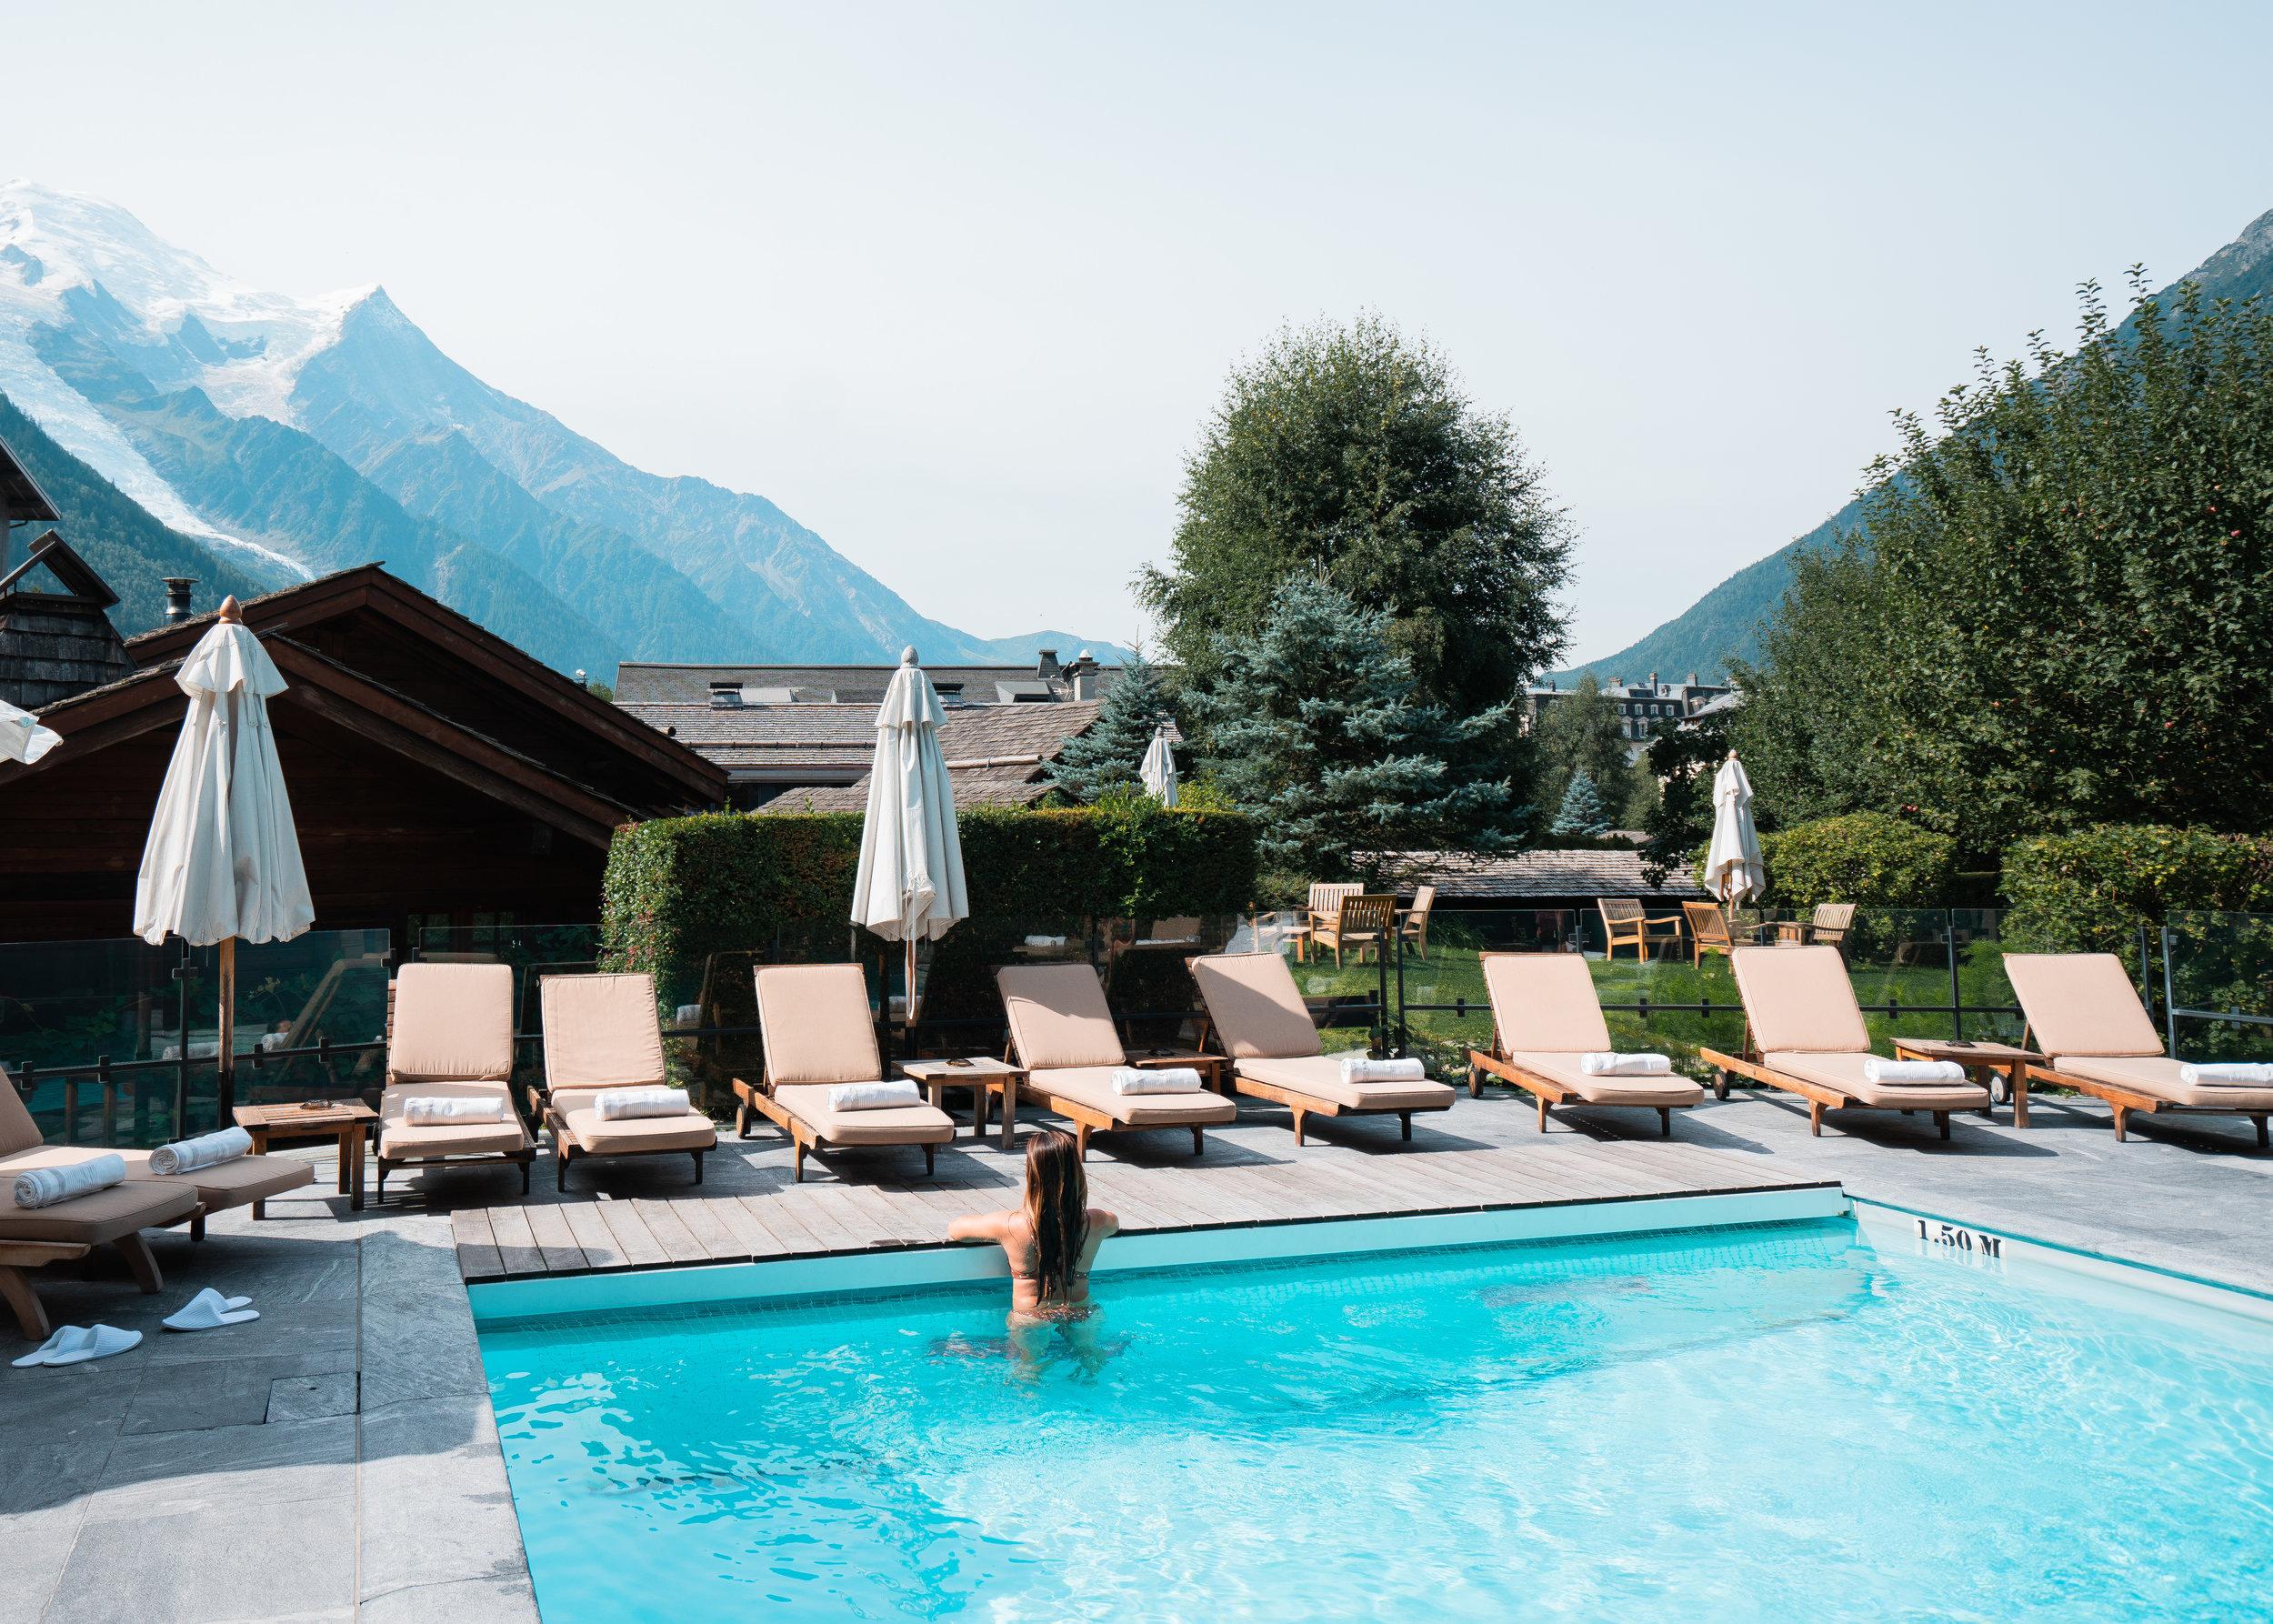 Hameau Albert 1er's outdoor pool